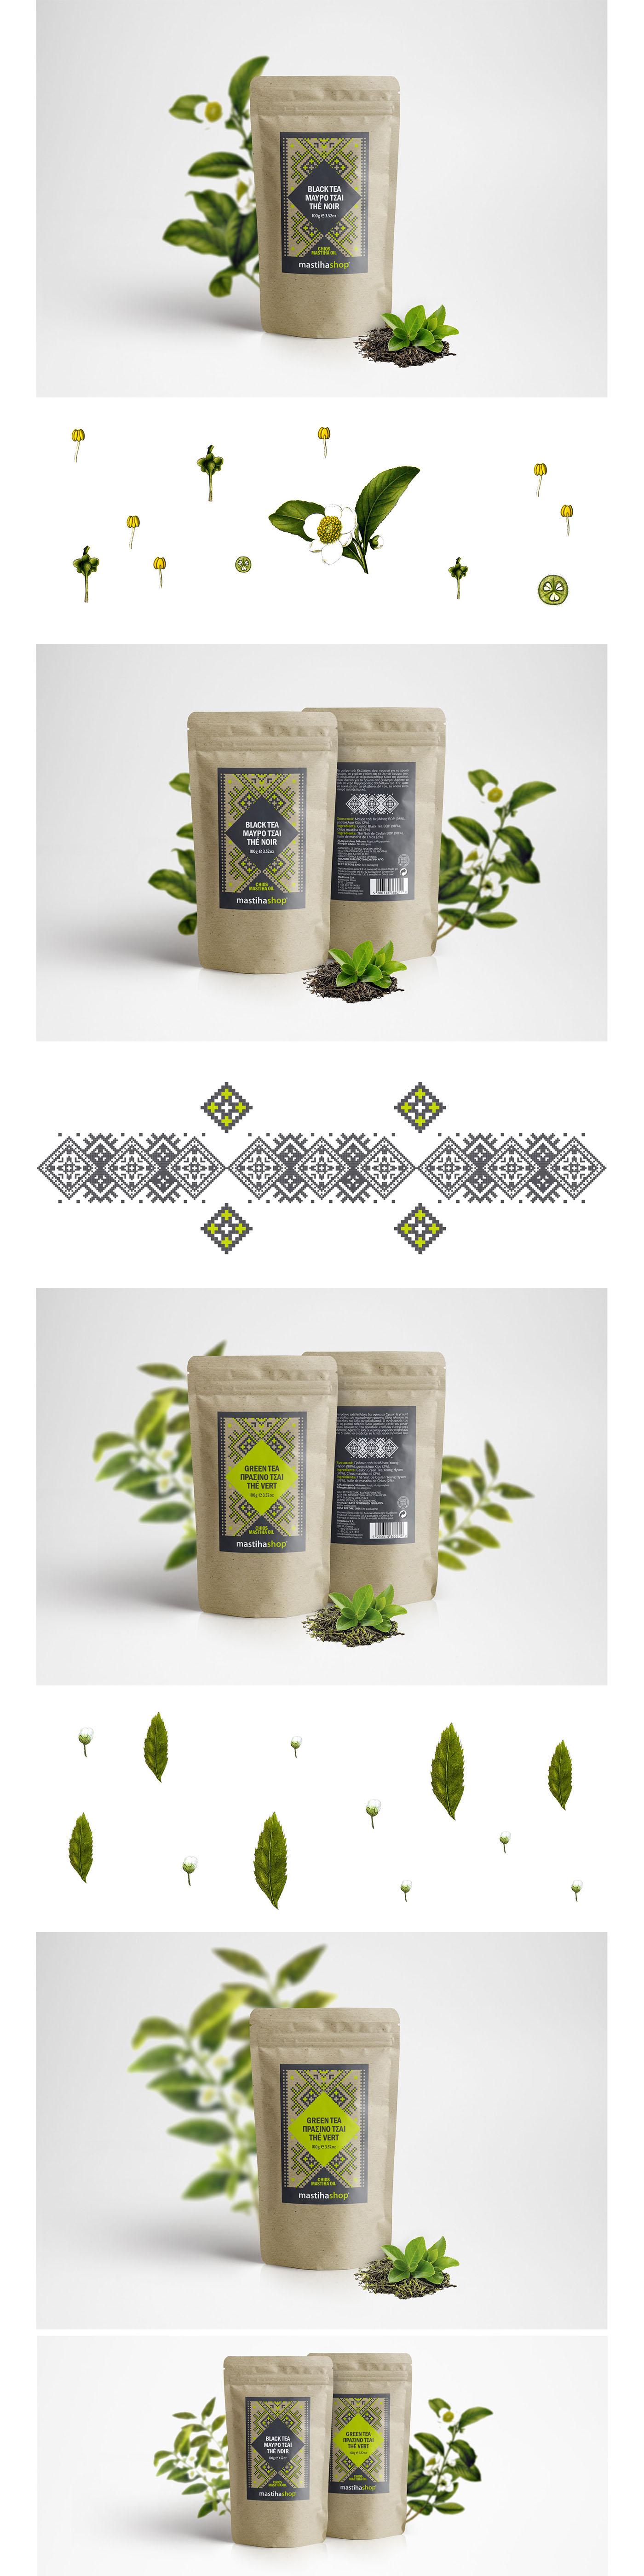 Mediterra SA Ceylon extract beverage Chios mastiha oil Packaging product design series print Greece